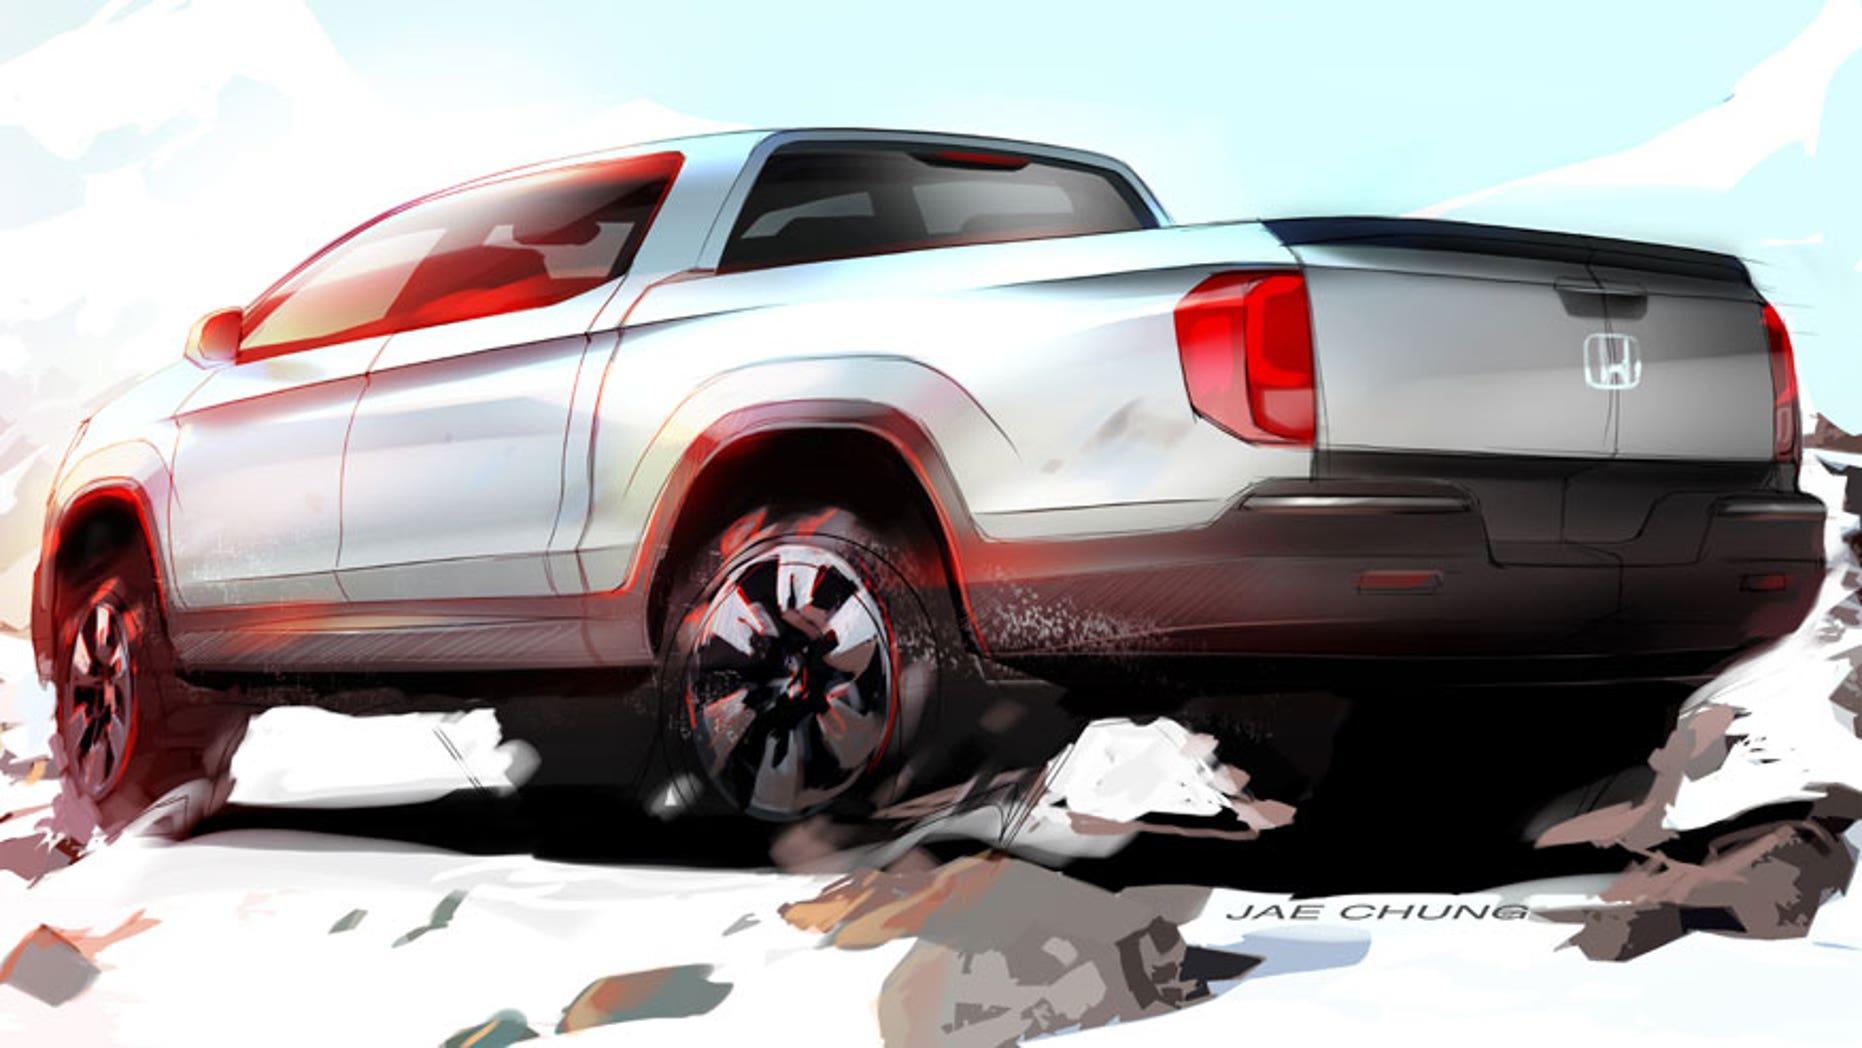 New Honda Ridgeline Design Partially Revealed In Sketch